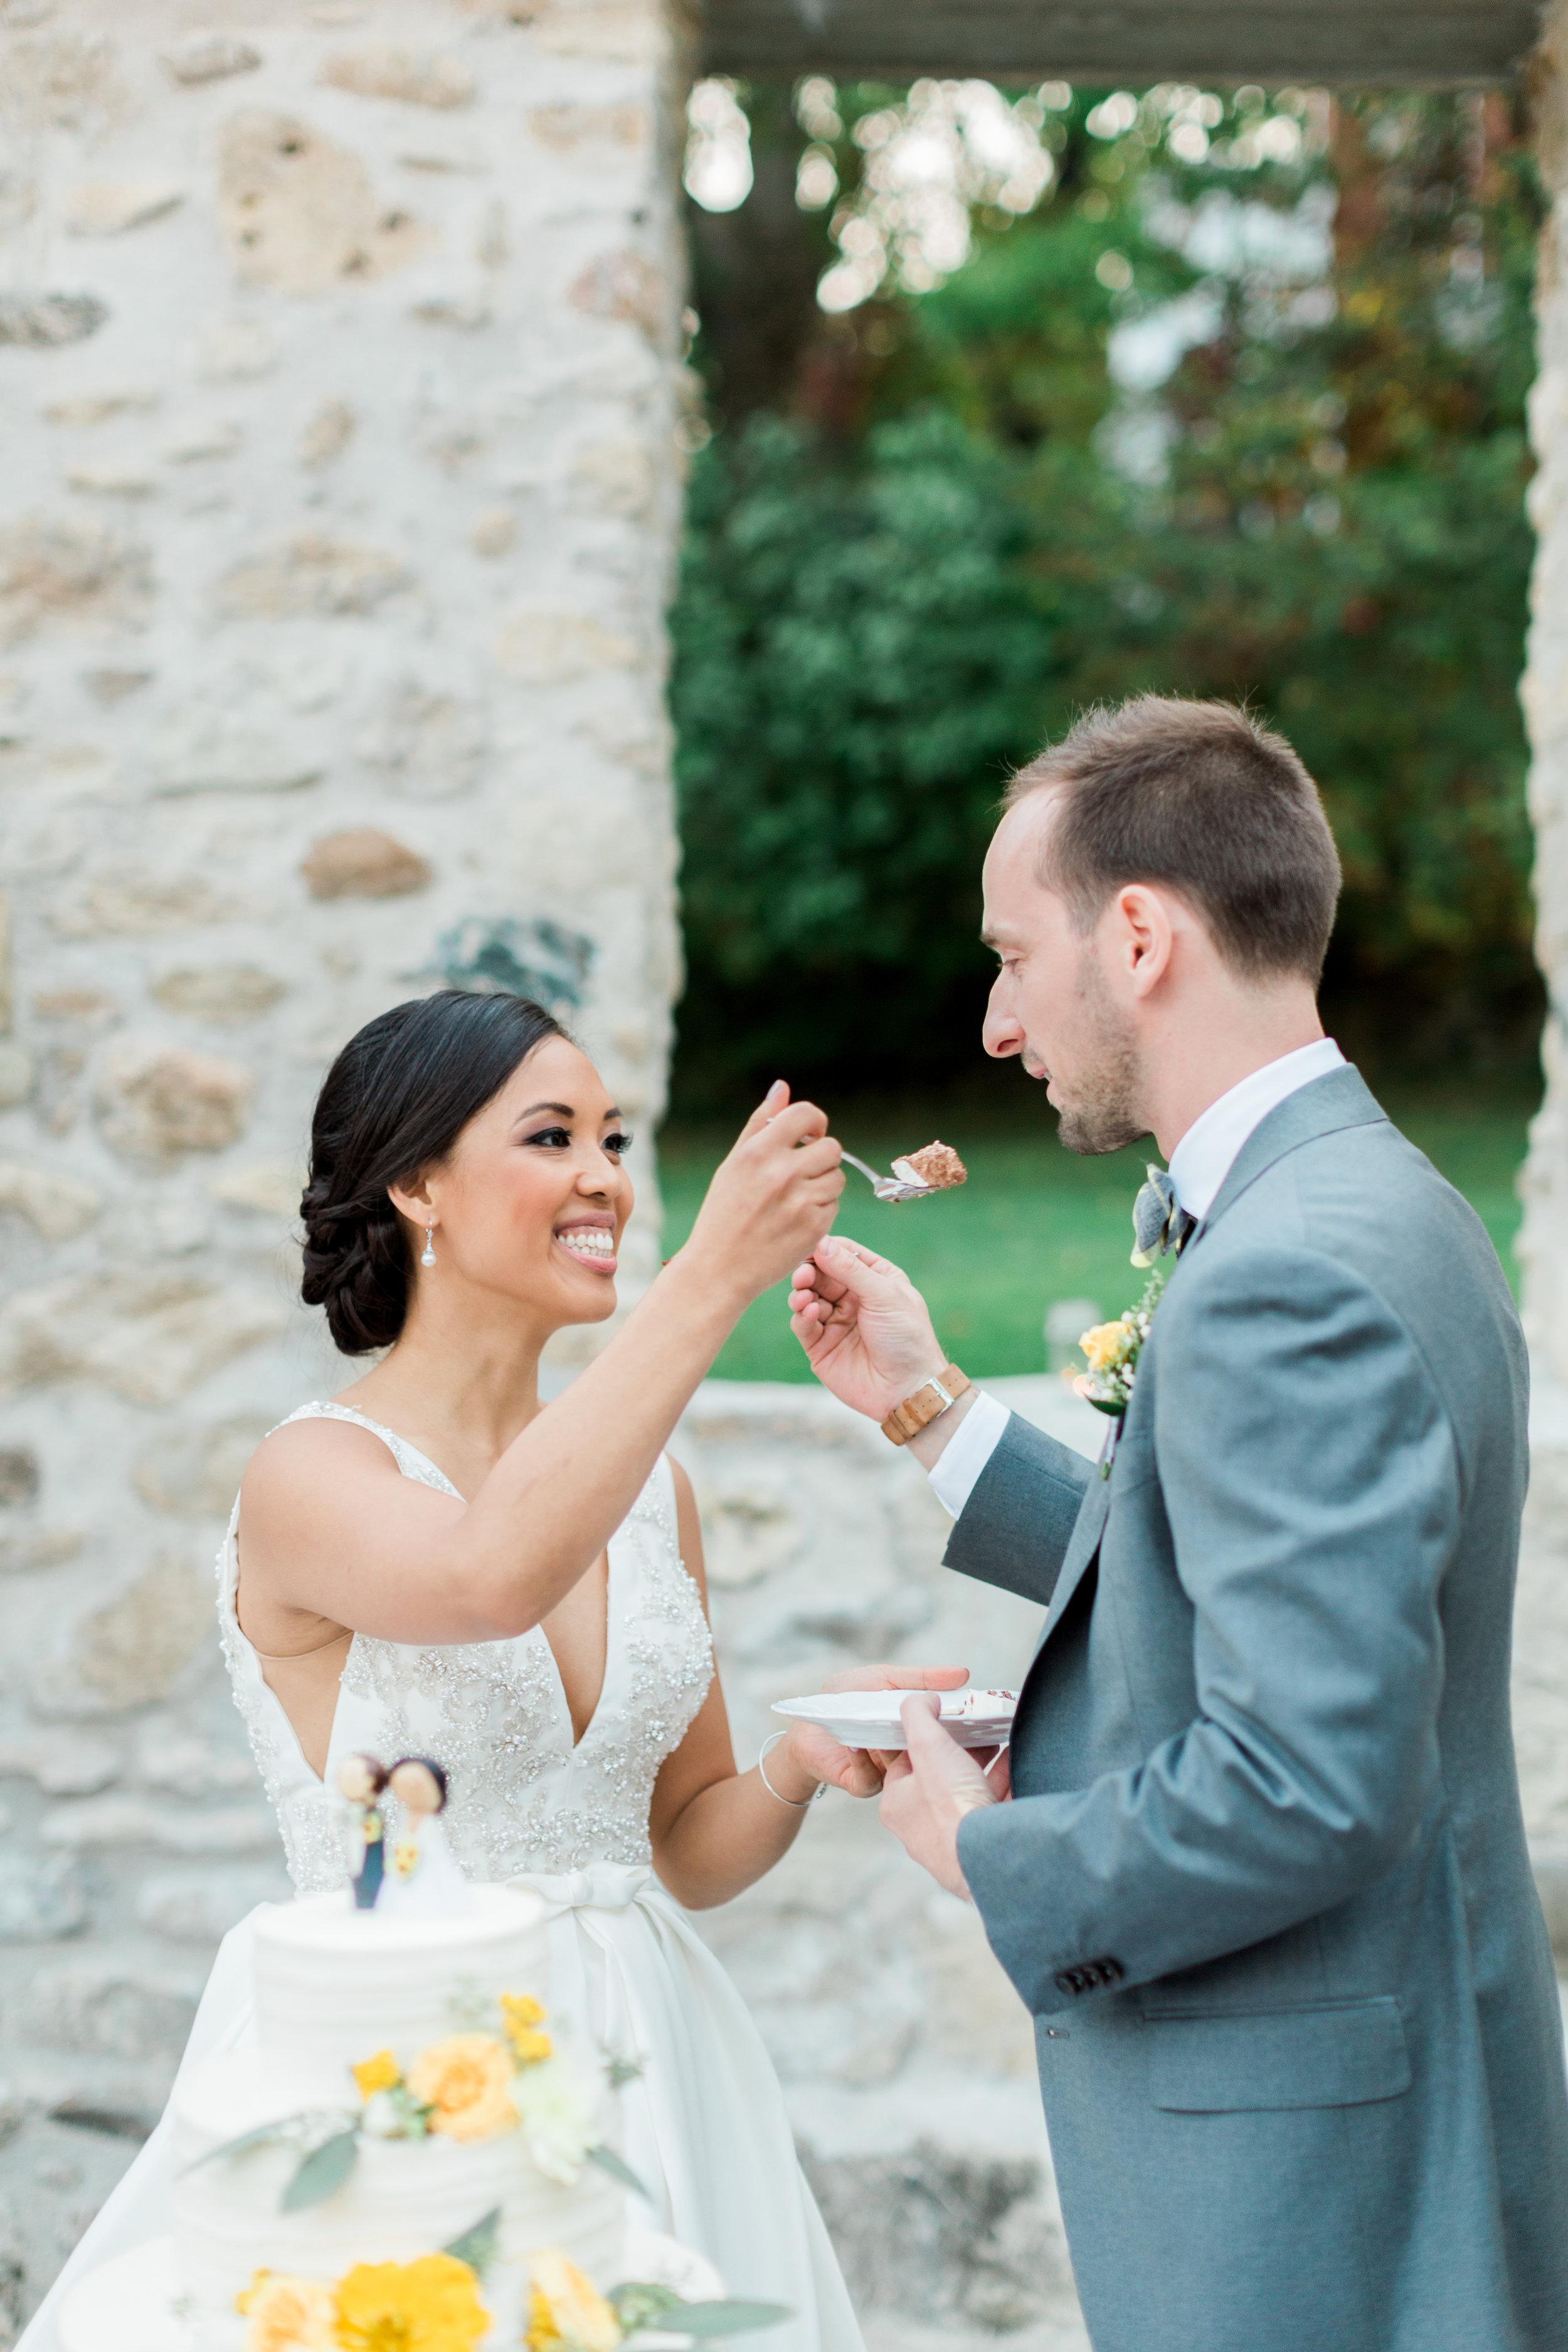 Alton Mills Wedding - Reception-77.jpg